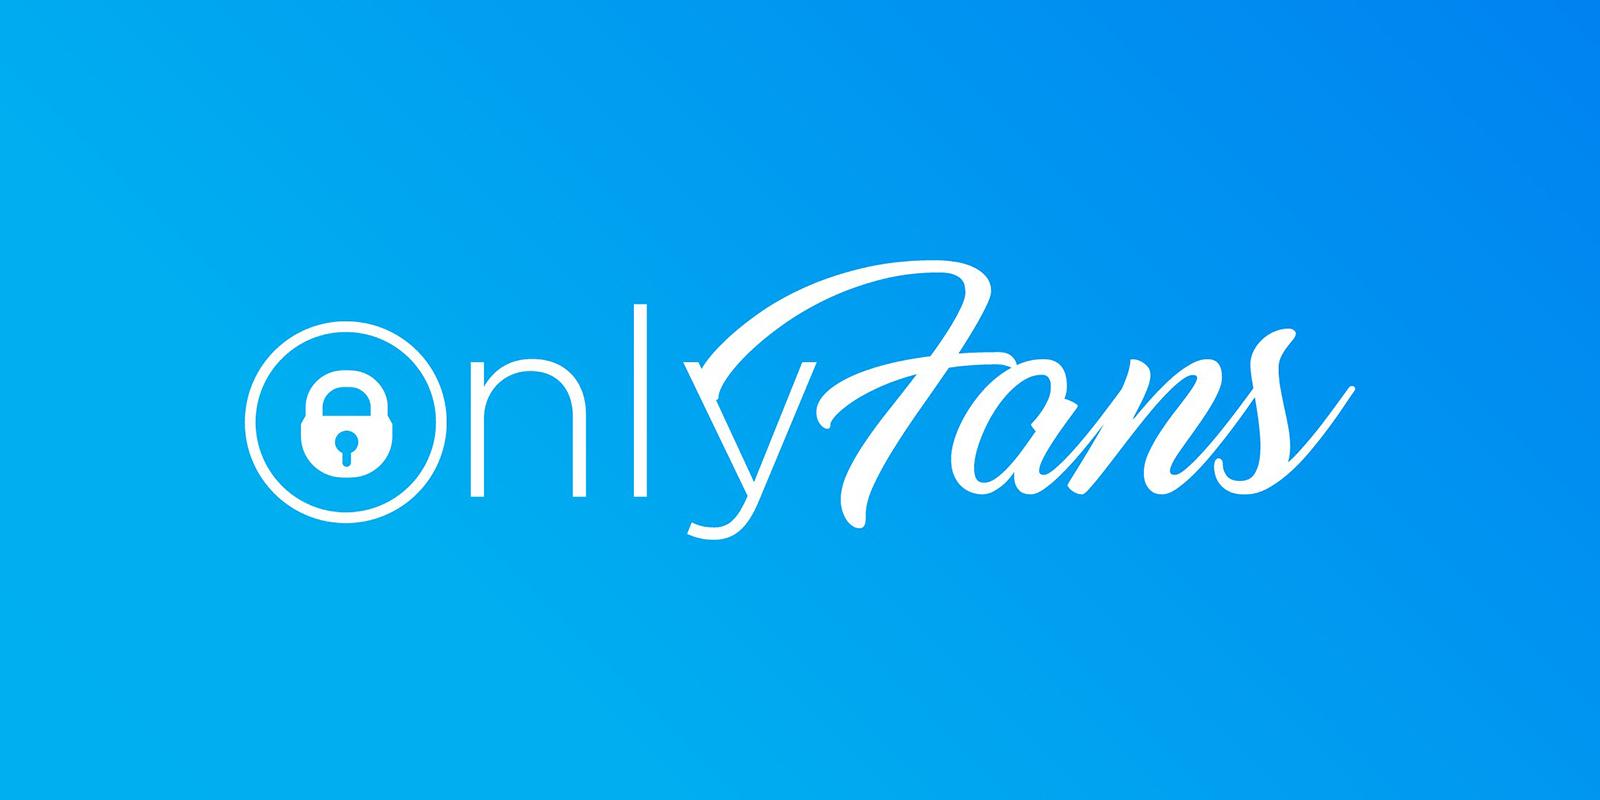 Обнаружена крупная утечка контента для взрослых с платформы OnlyFans